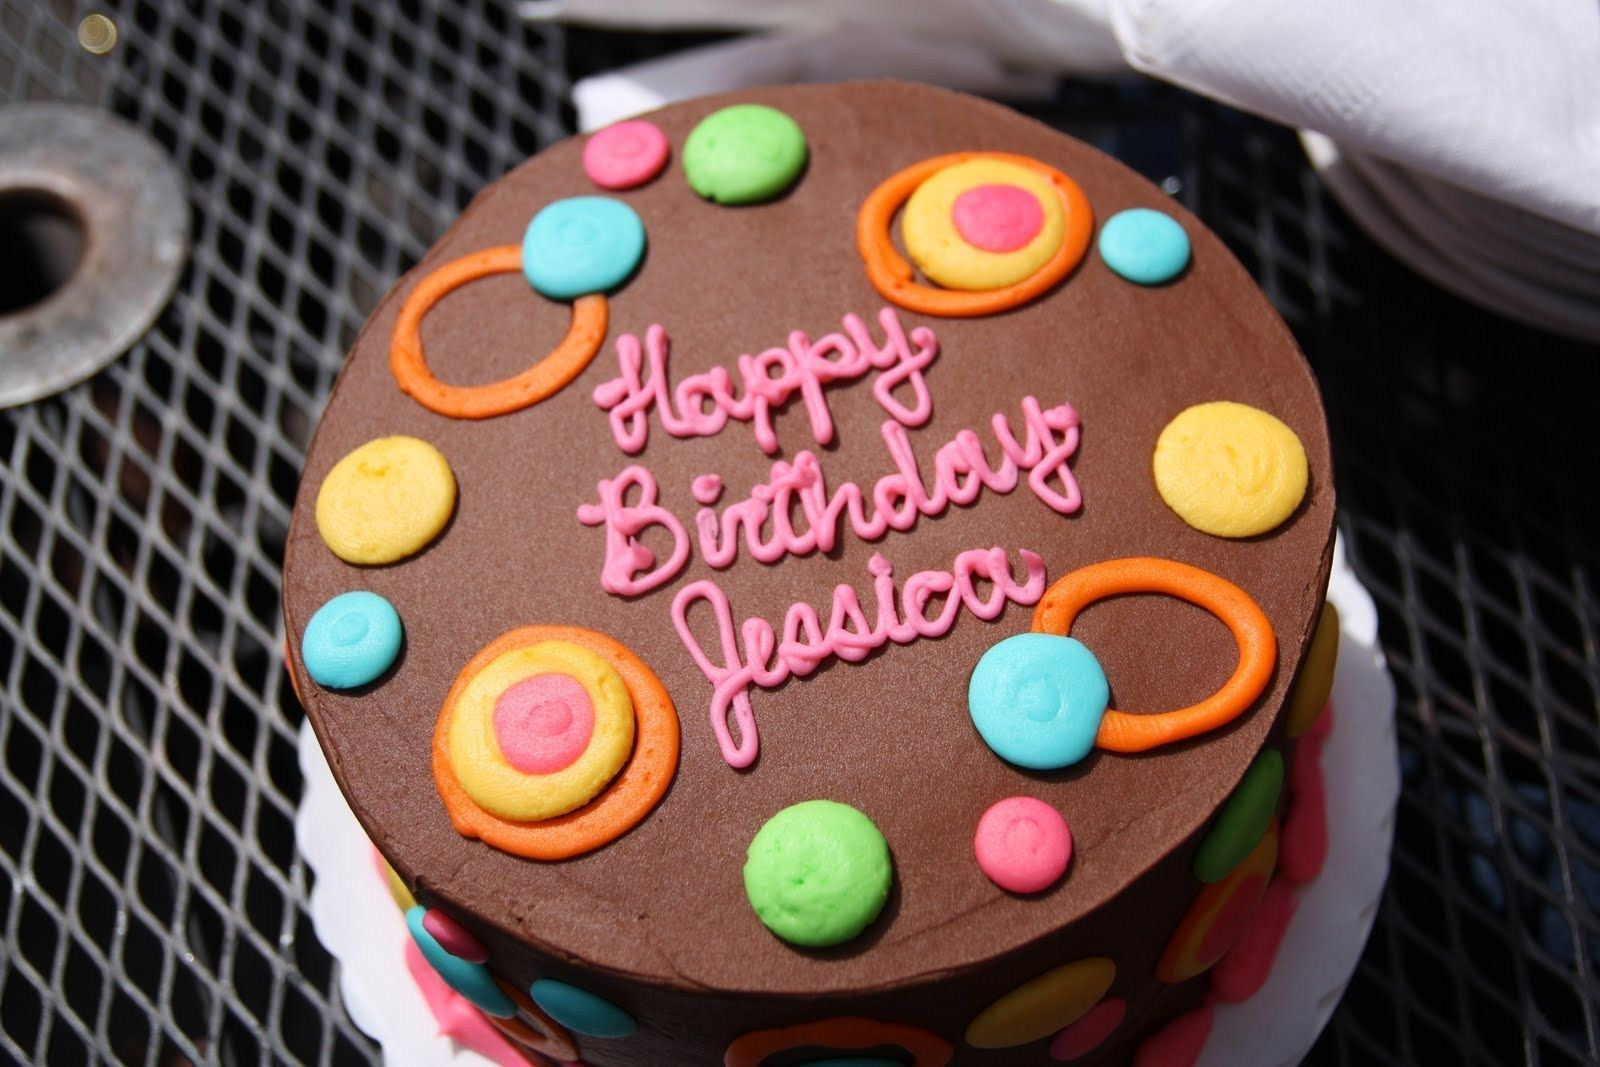 Terrific 27 Inspired Image Of Happy Birthday Jessica Cake Cake Birthday Funny Birthday Cards Online Inifodamsfinfo